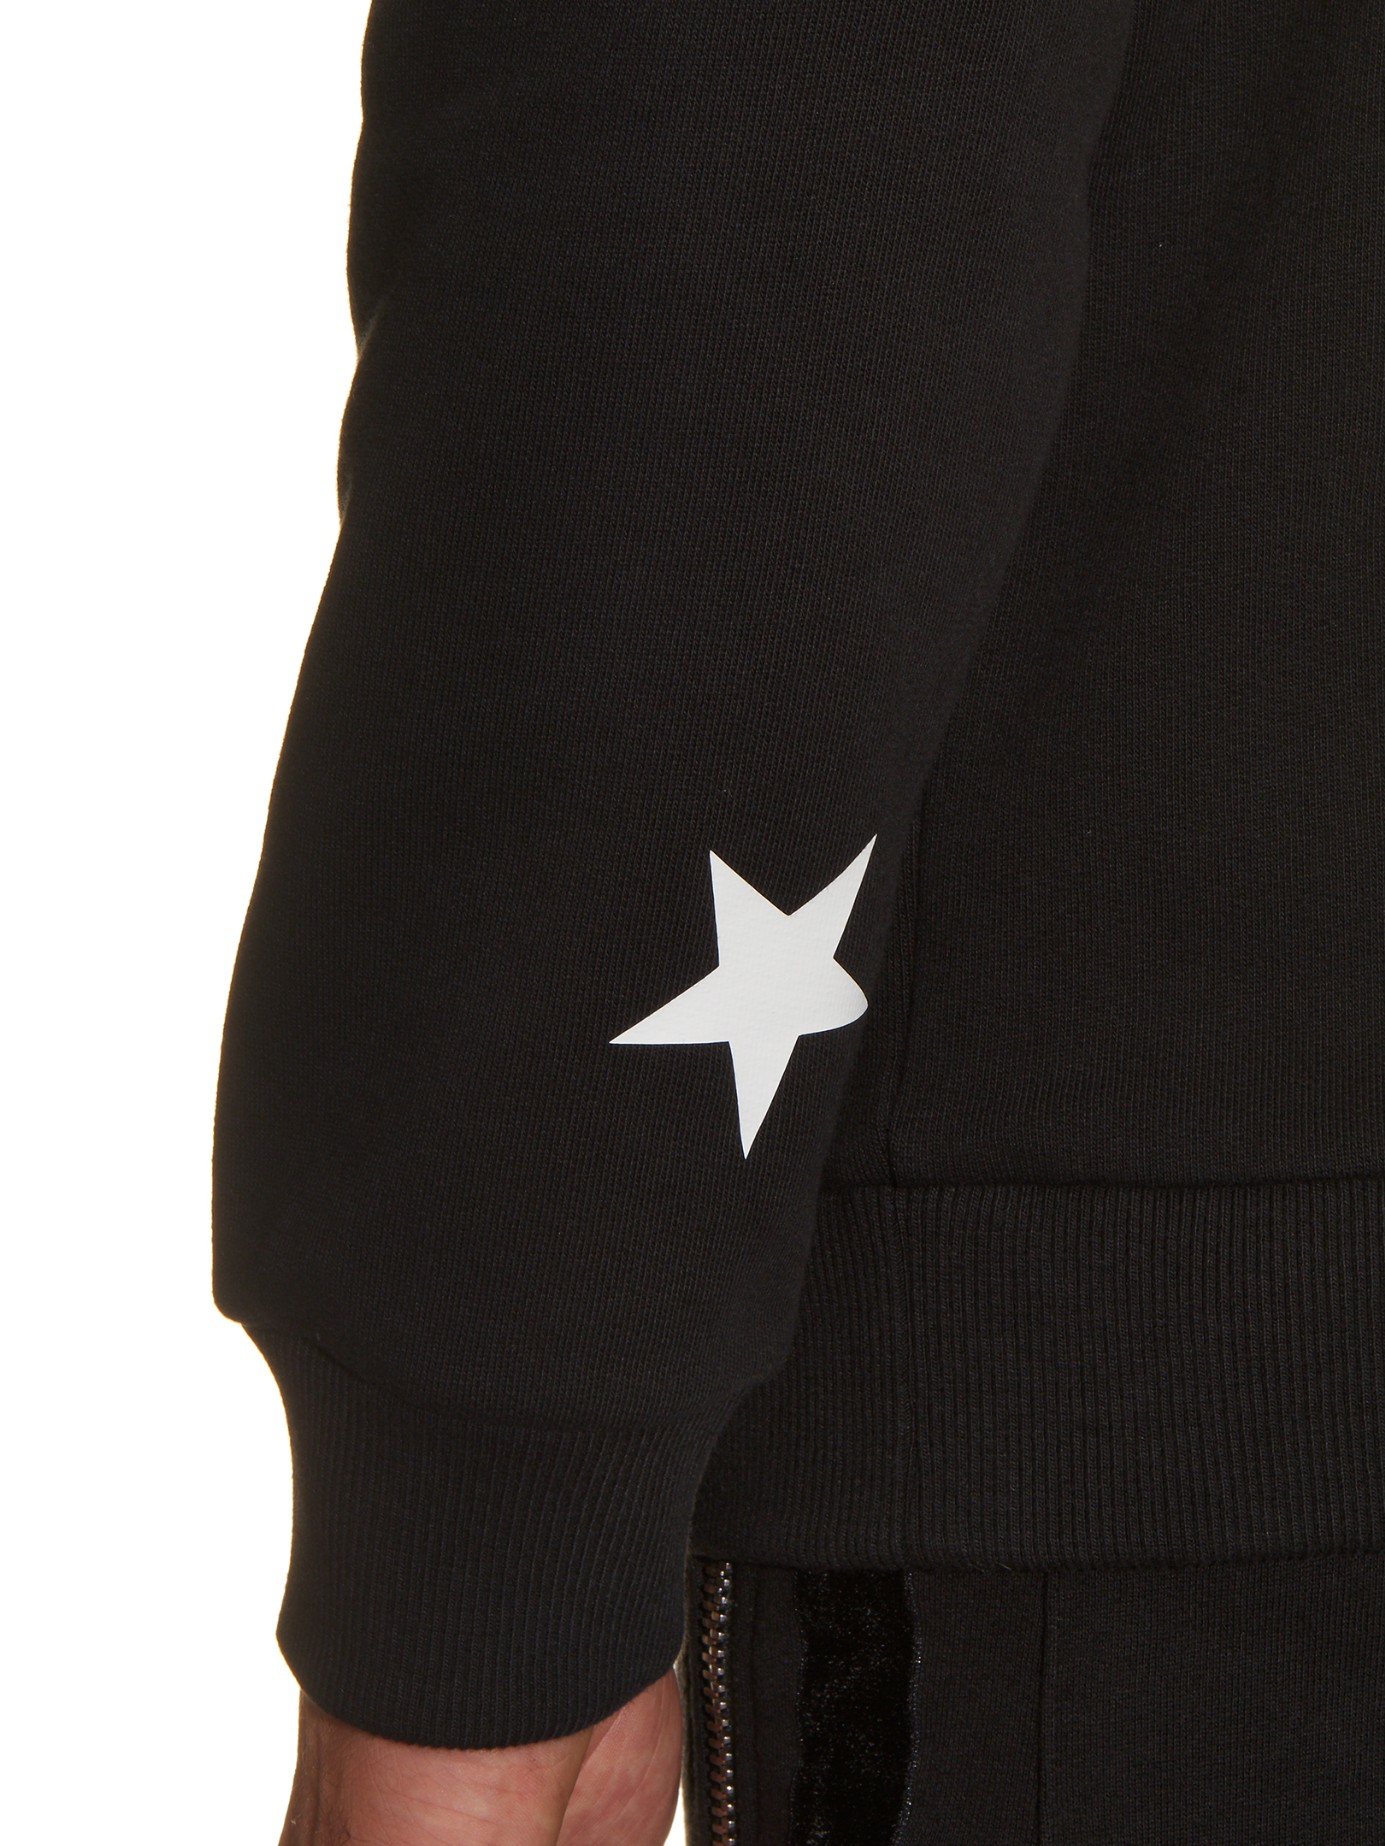 b87f44acb Givenchy Cuban-fit Skull-print Hooded Sweatshirt in Black for Men | Lyst